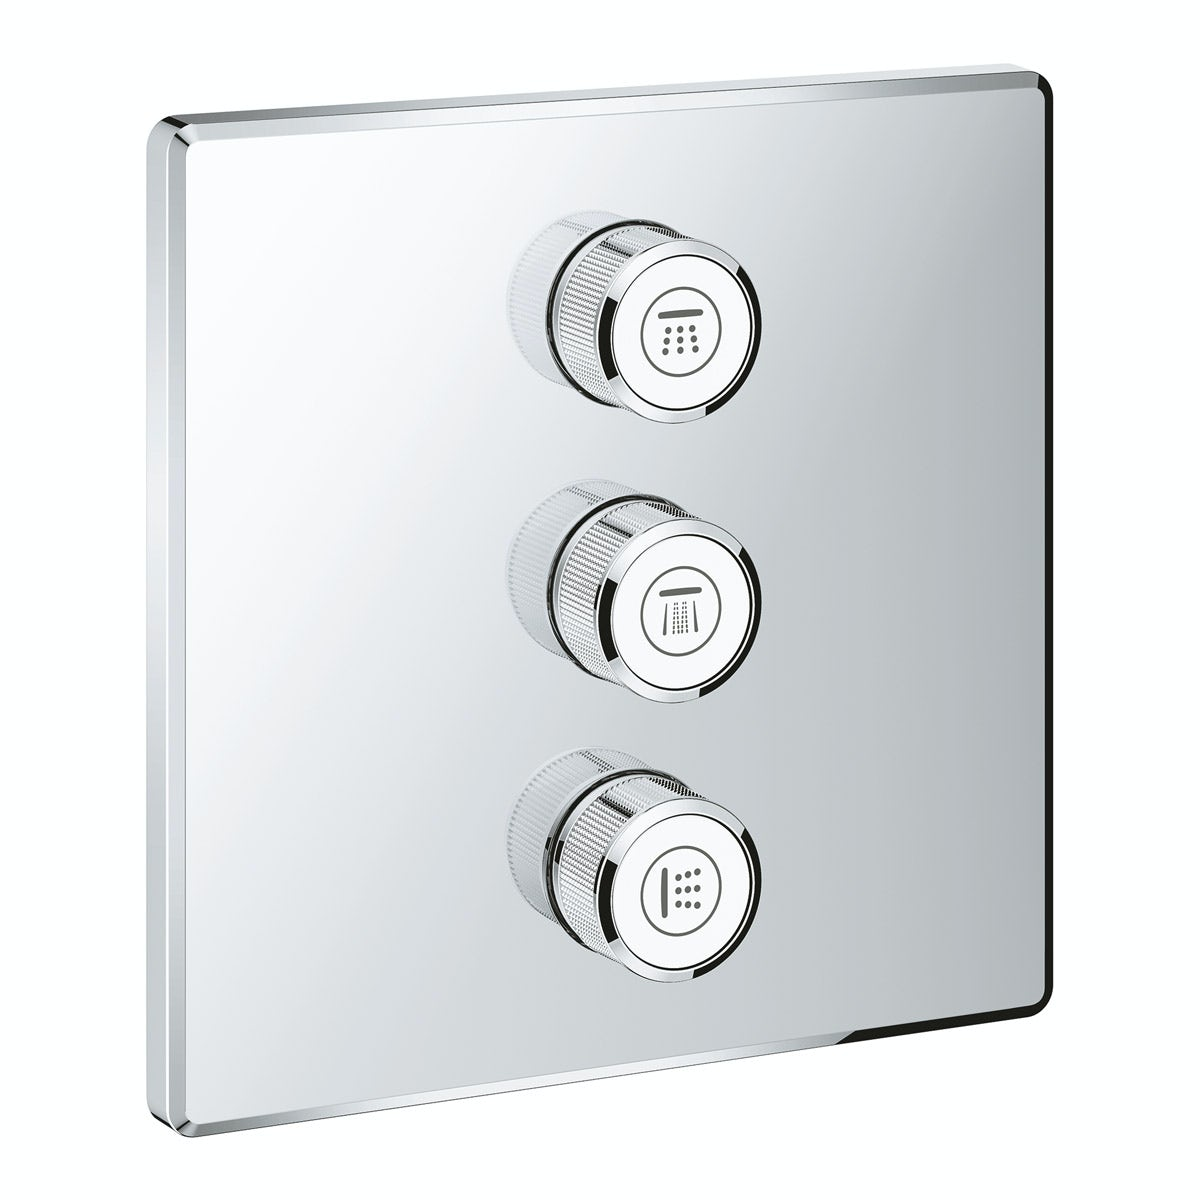 Grohe Grohtherm SmartControl square triple volume control shower valve trimset